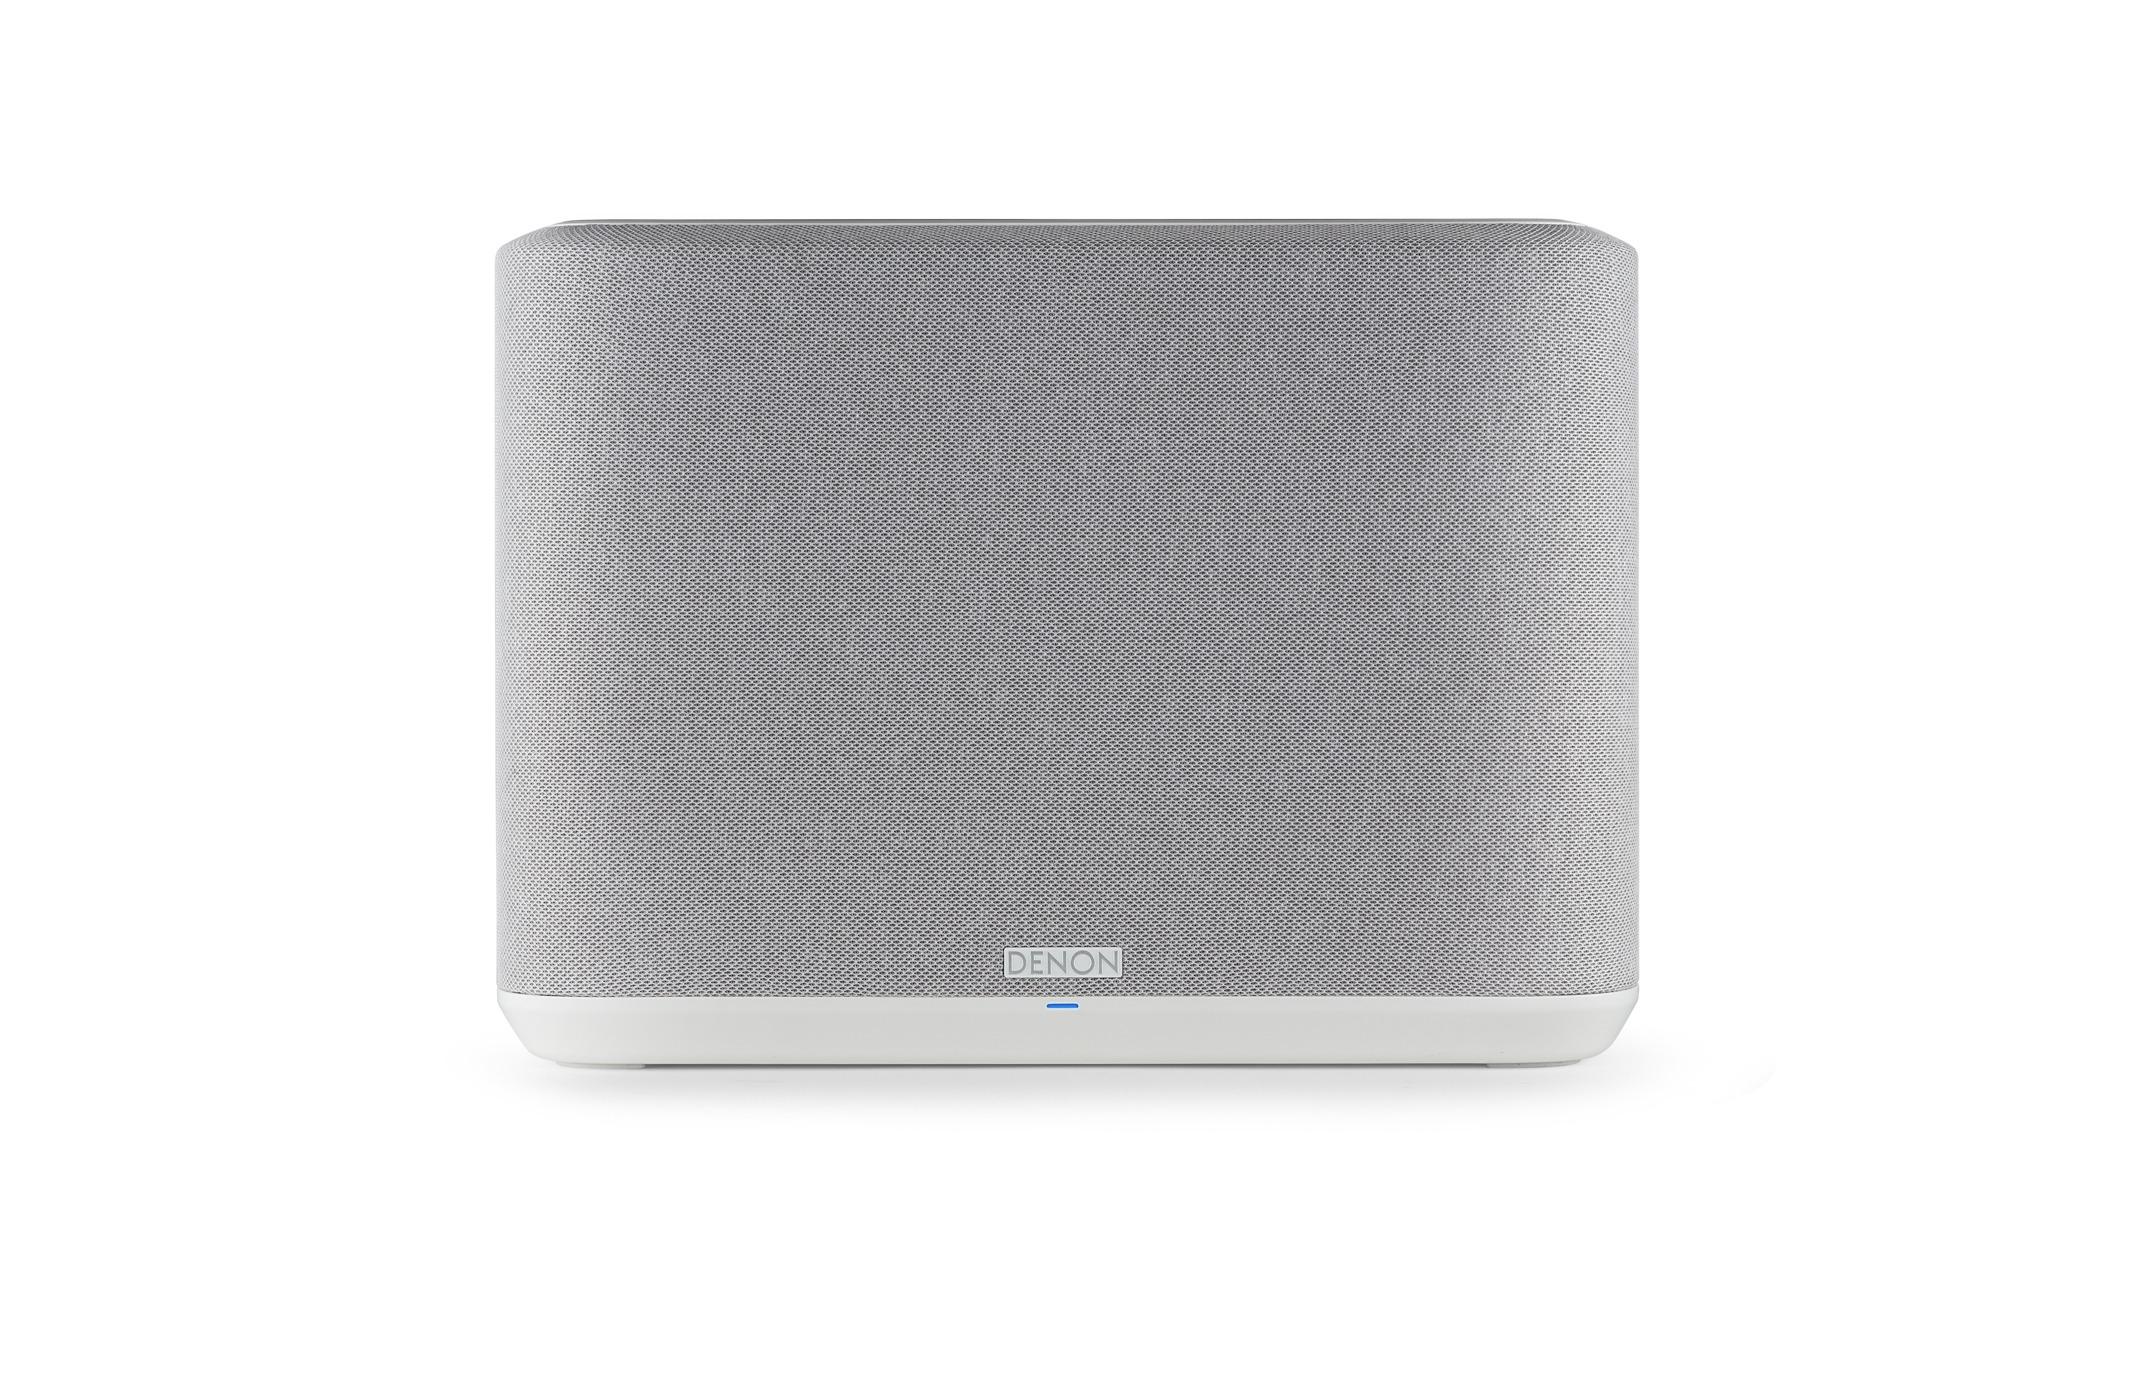 Foto van Denon HOME 250 Wifi speaker